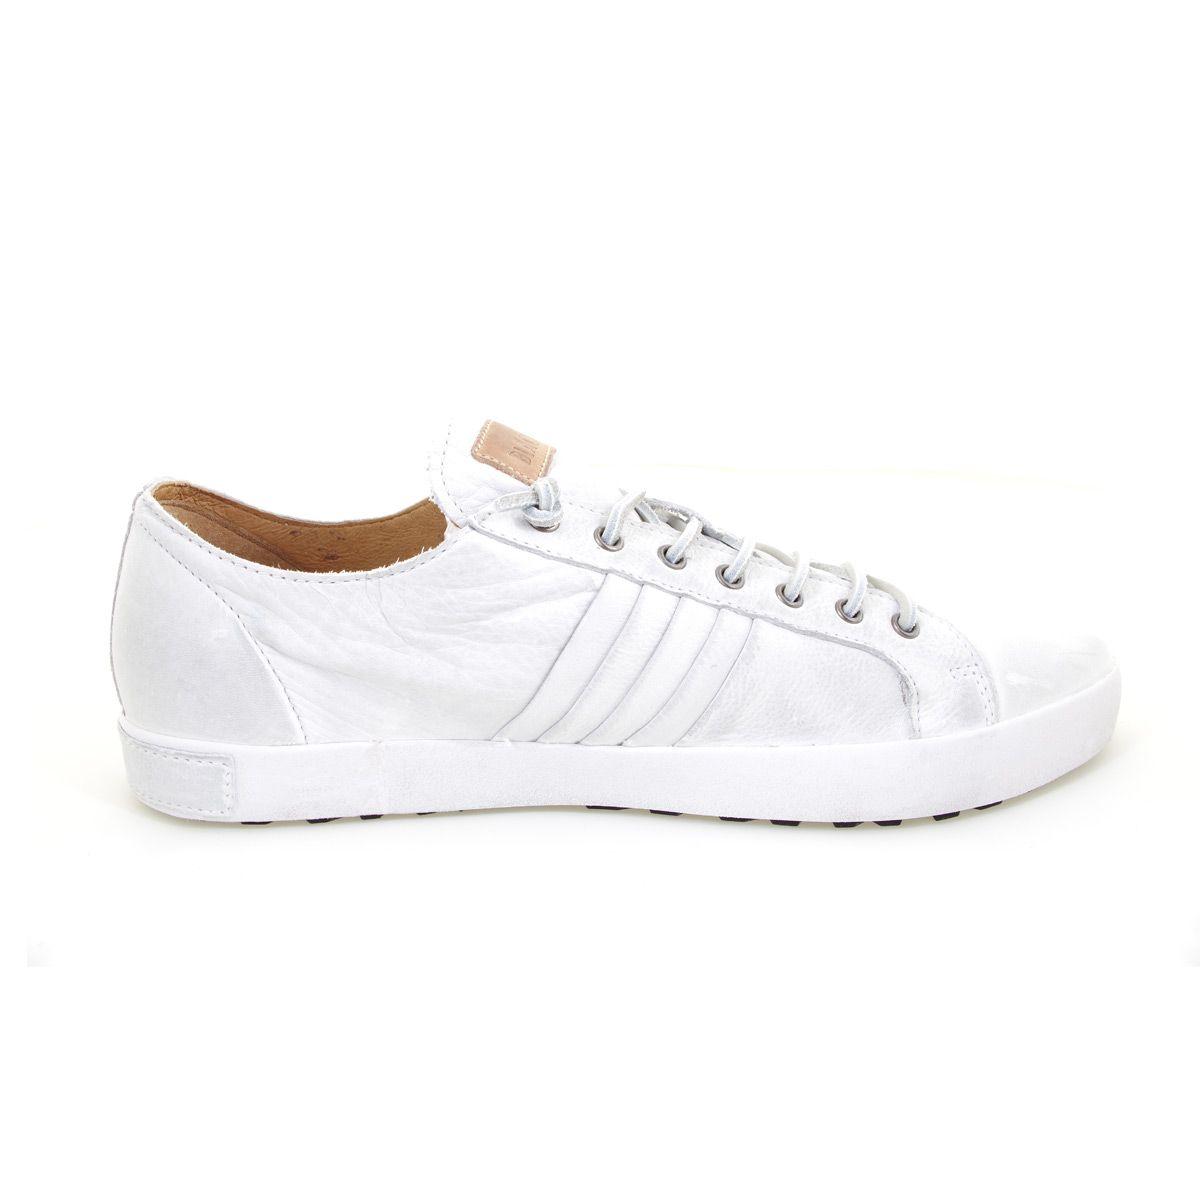 chaussures sneaker blanc grande taille du 46 au 50 size. Black Bedroom Furniture Sets. Home Design Ideas